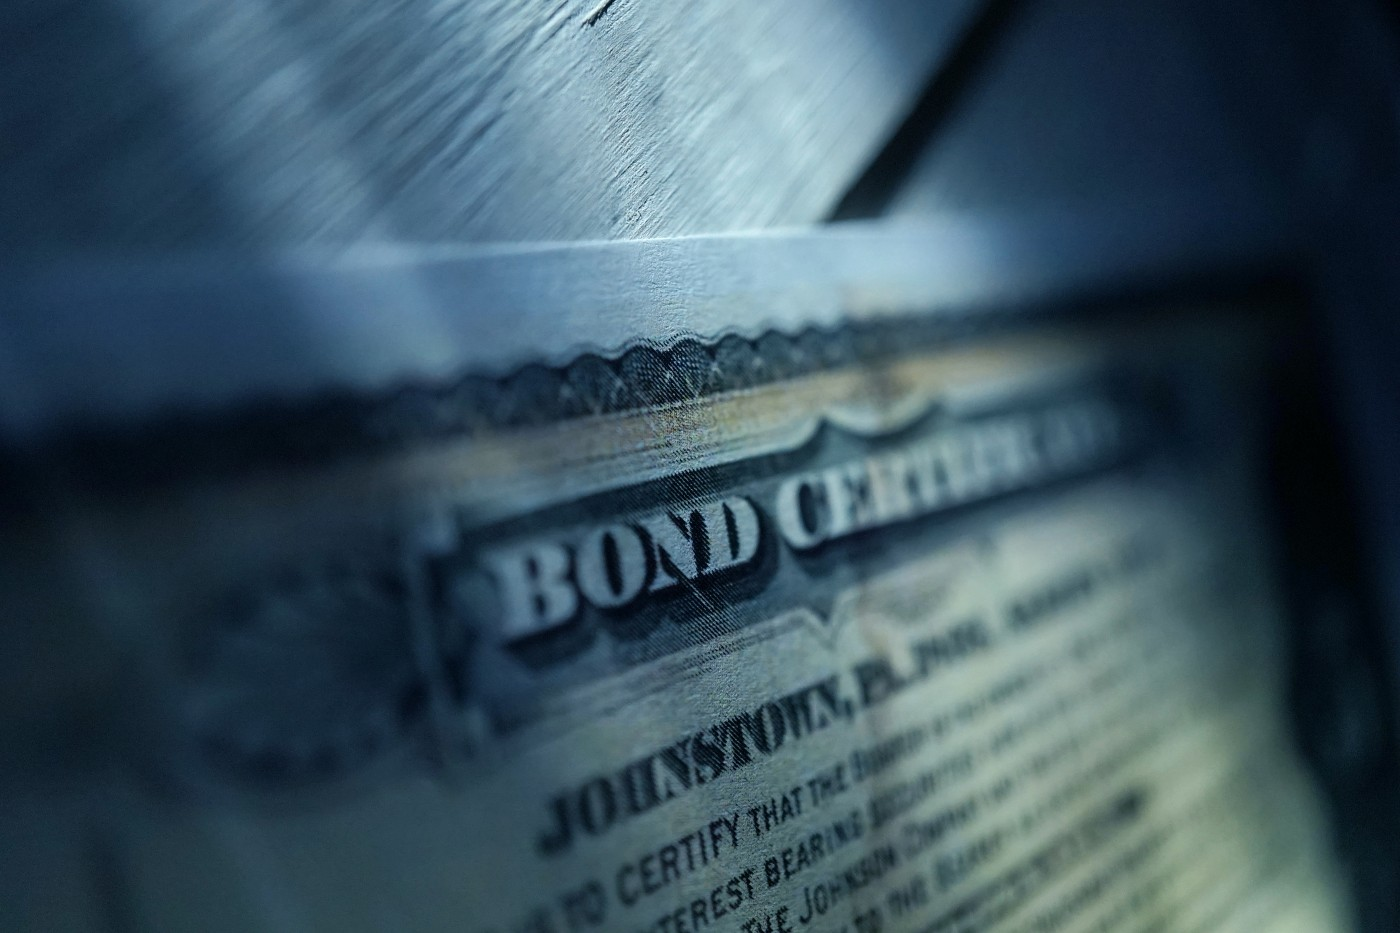 https://tickertapecdn.tdameritrade.com/assets/images/pages/md/Bond certificate: Que sont les obligations?